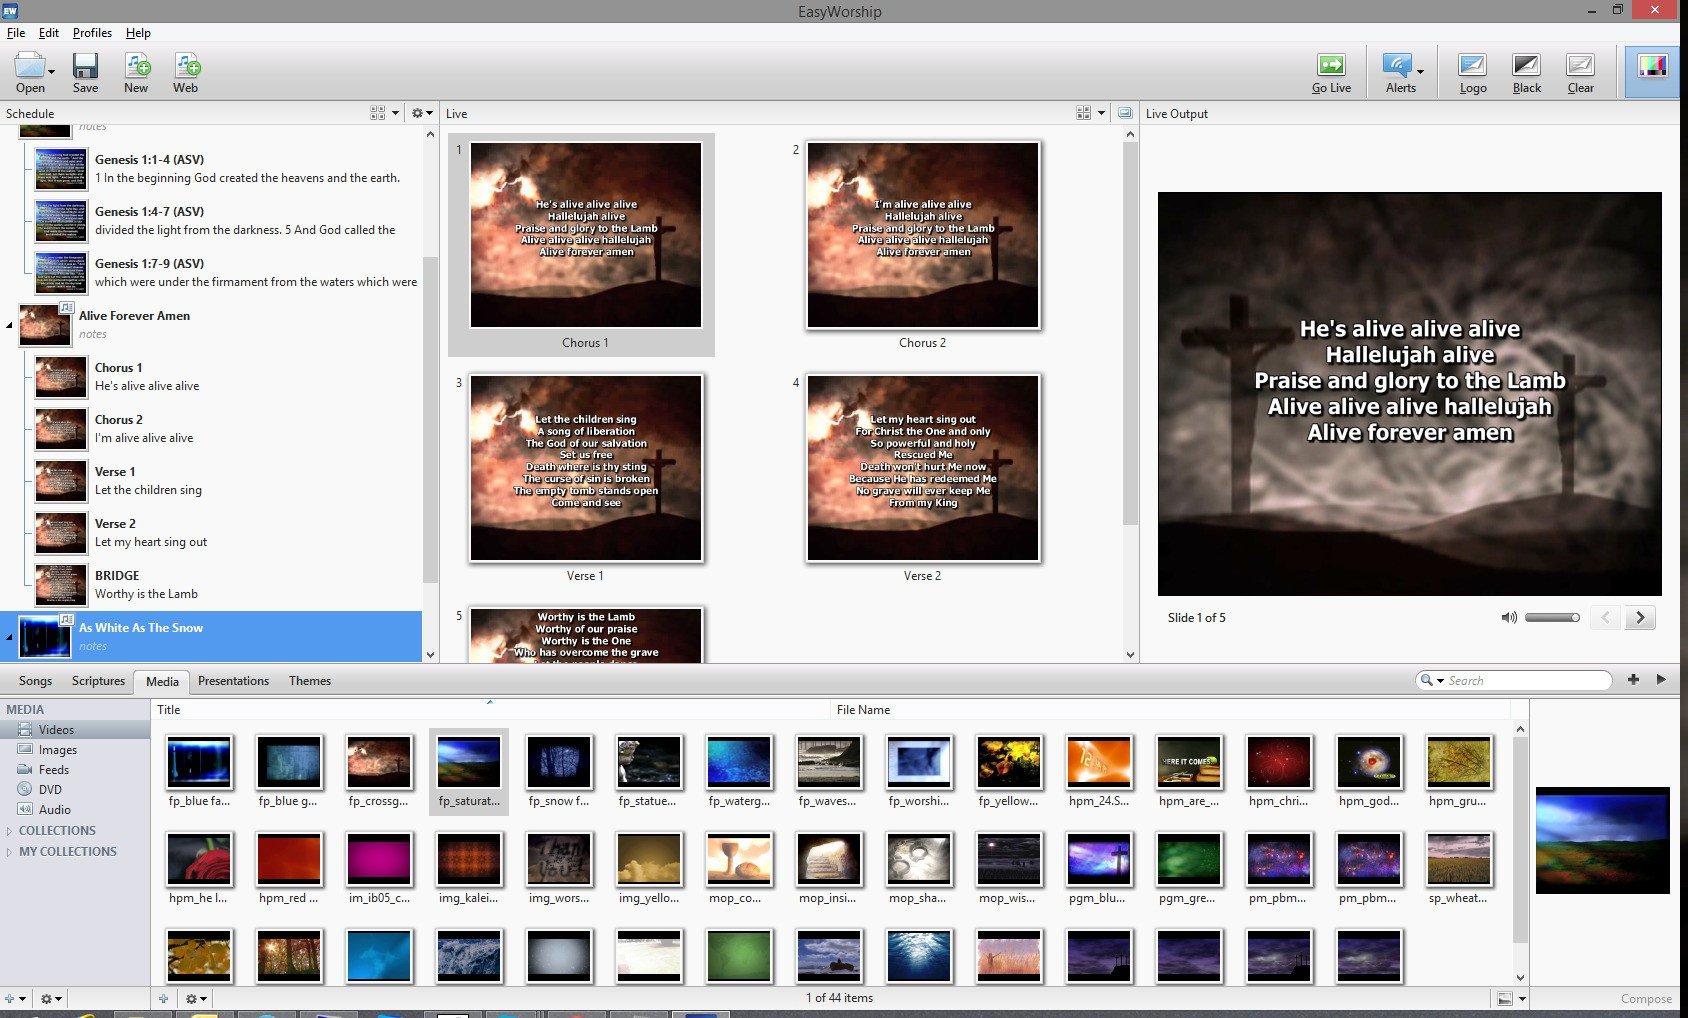 EasyWorship 7.0.4.1 Full Crack + Product Key Free Torrent Download